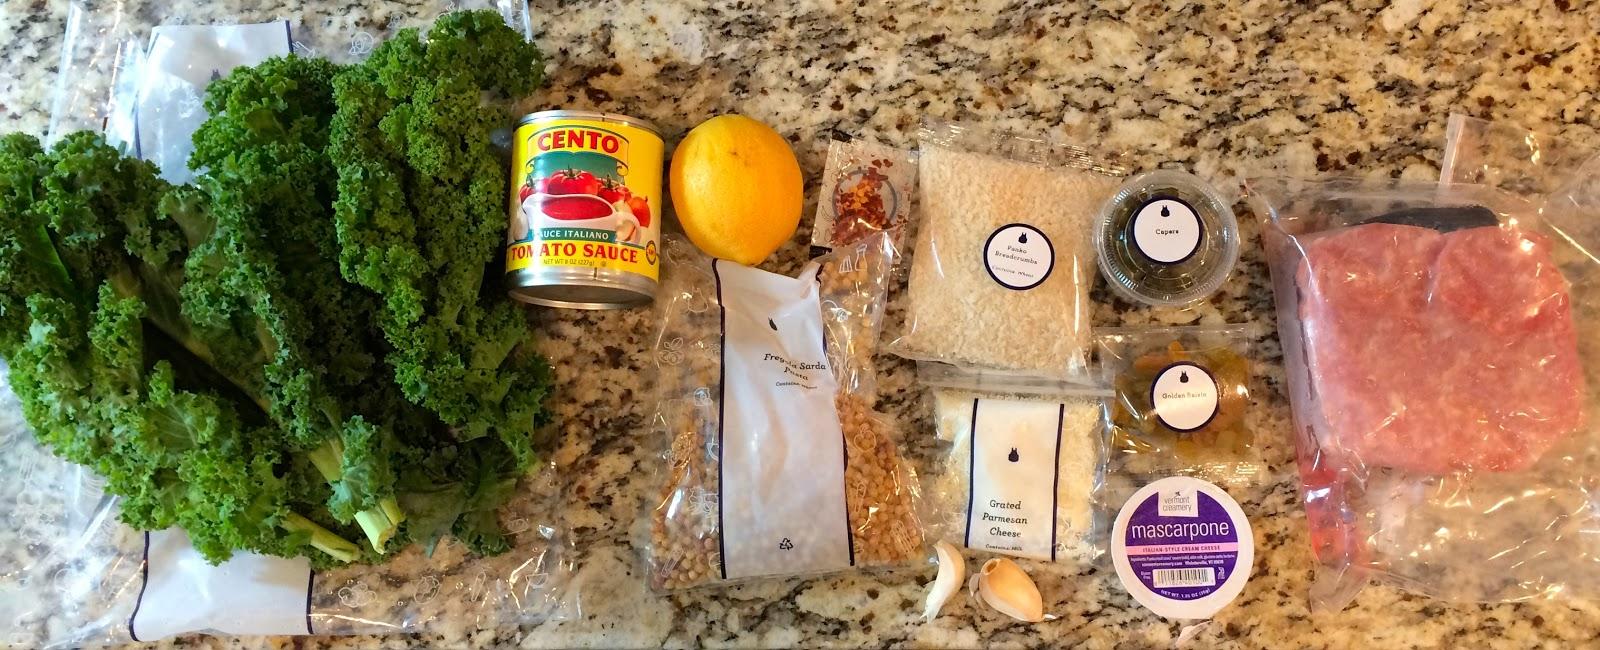 Blue apron katsu catfish - Chicken Meatballs Fregola Sarda With Kale Sicilian Tomato Sauce